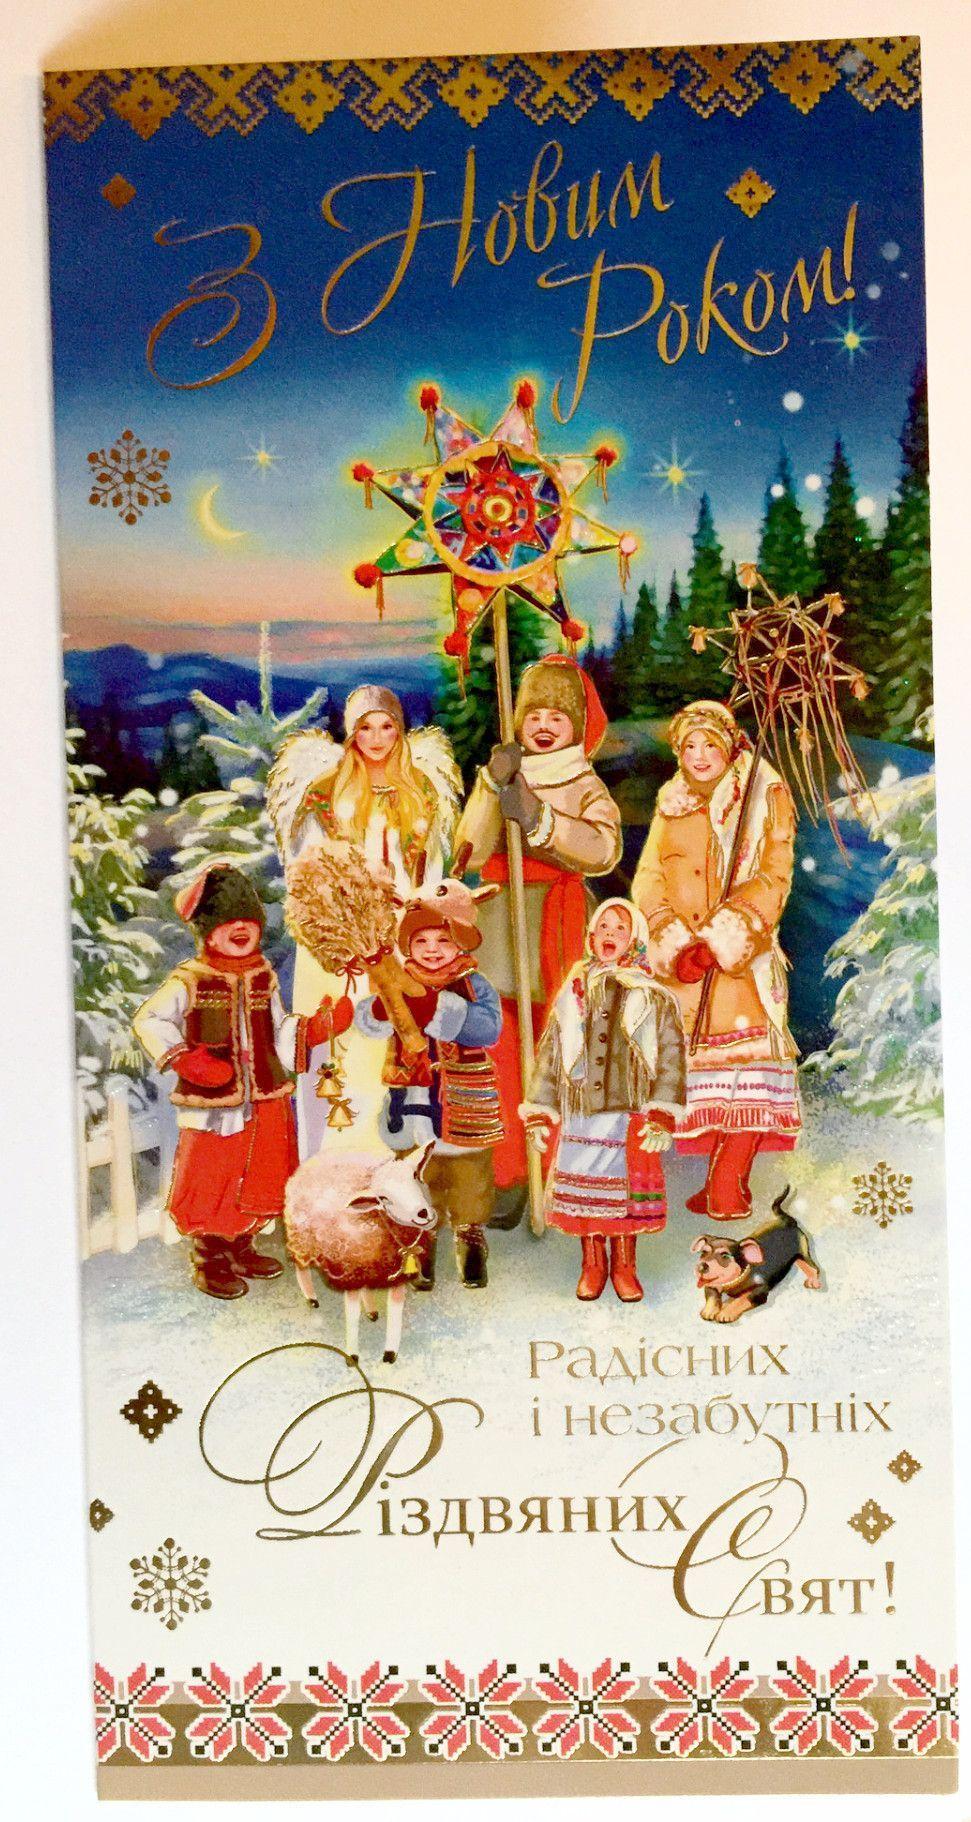 Glossy and shiny Christmas cards from Ukraine. Amazingly